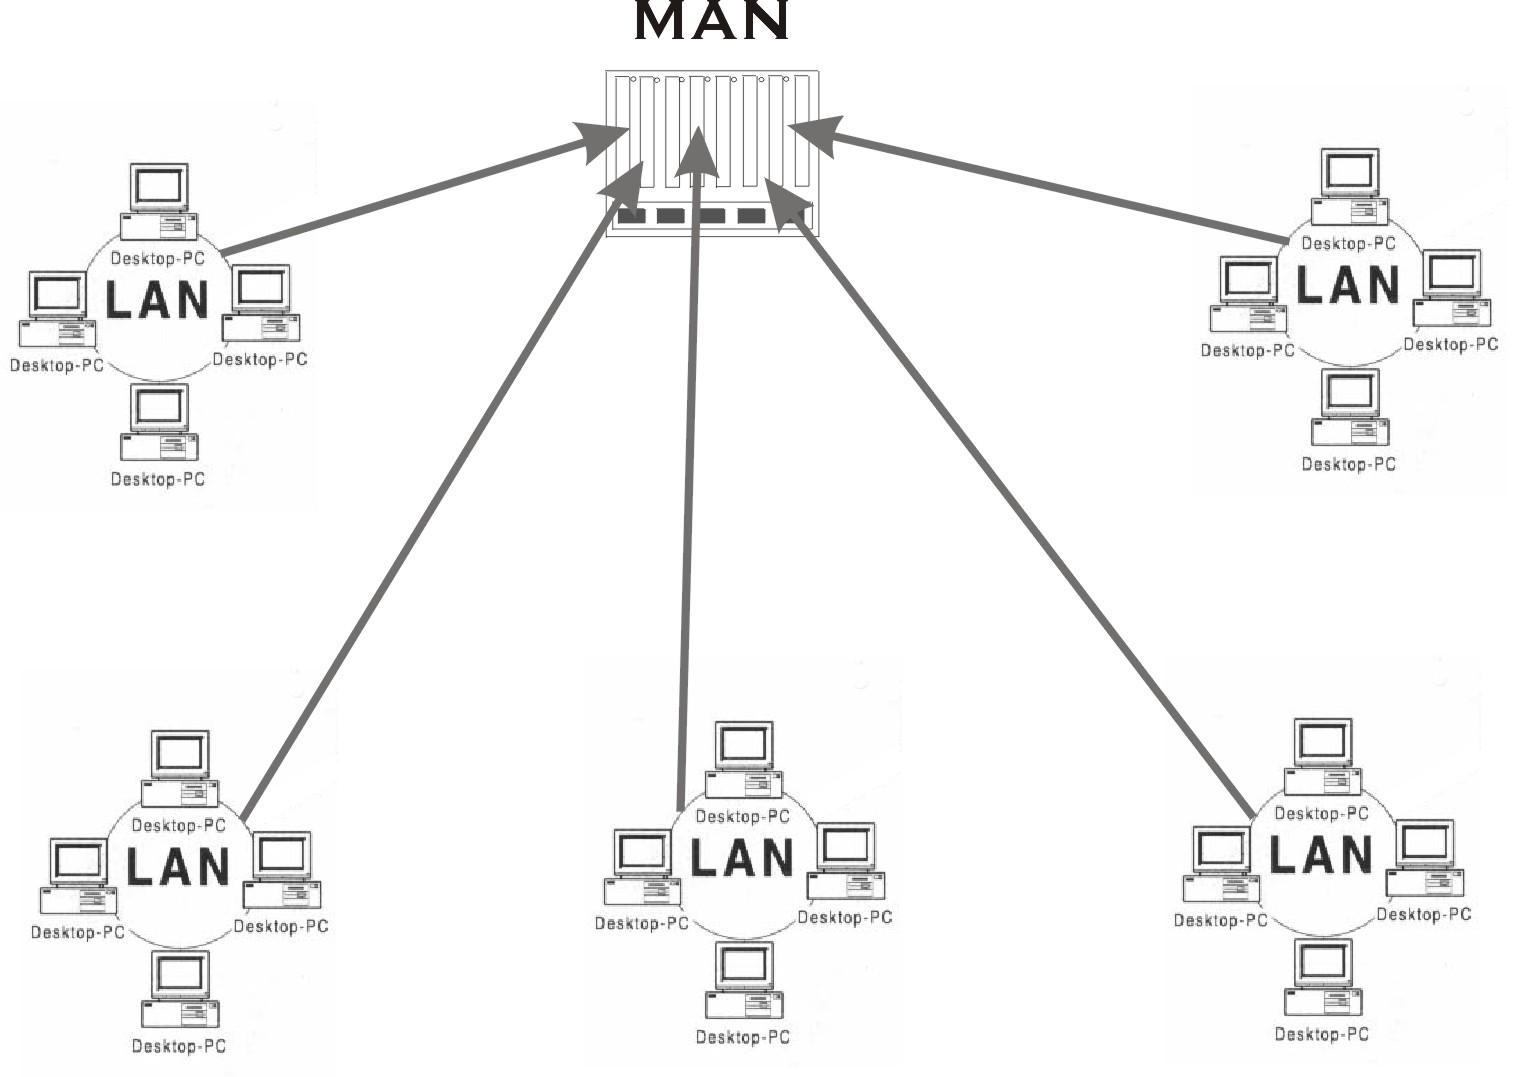 Best1articles Network